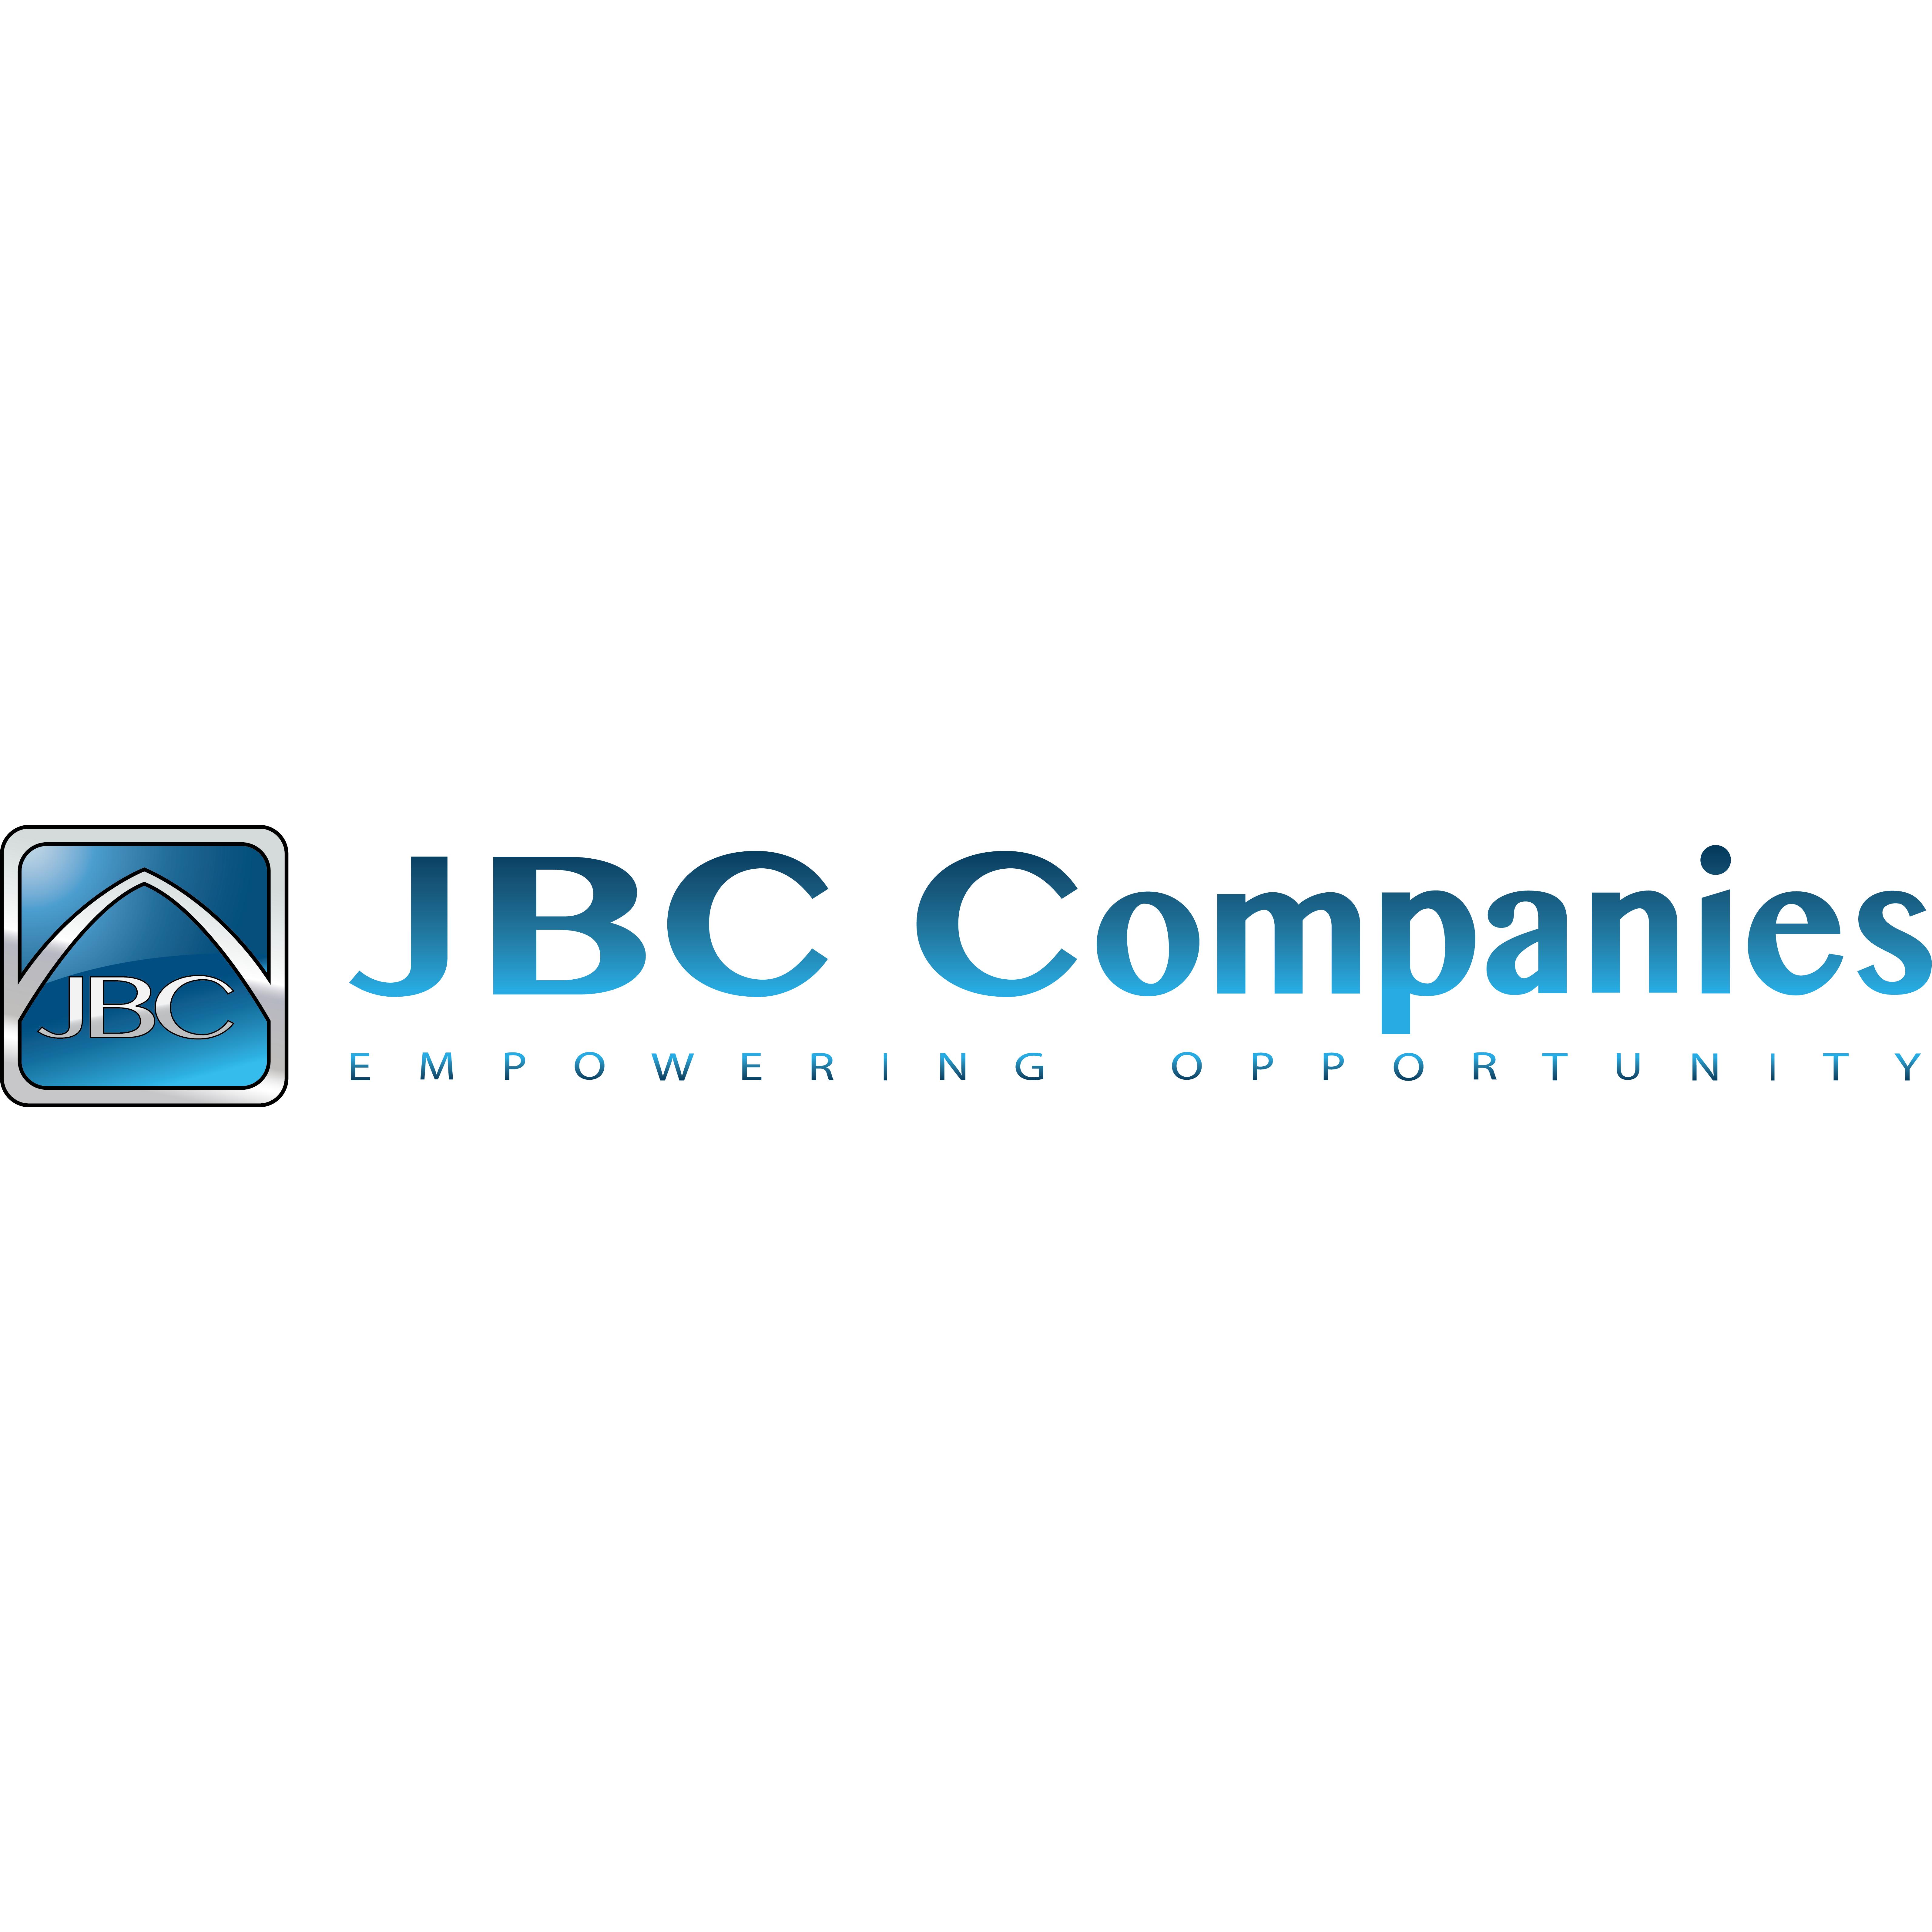 JBC Companies